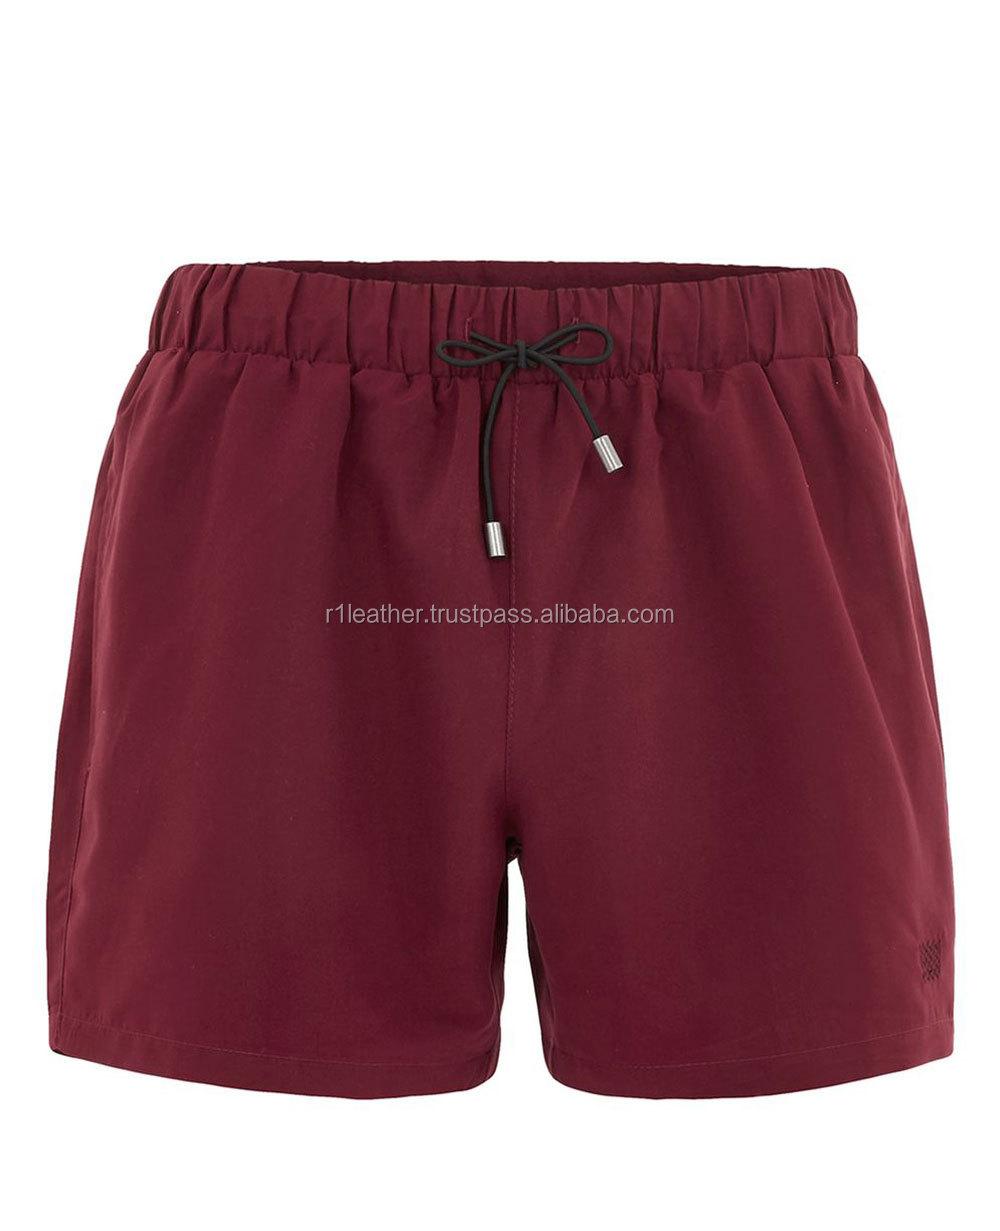 8e3409f893 Cheap Price Men Loose Short Beach Pants Dry Fit Gym Shorts/Floral Print  Runner bathing swimming men shorts beach